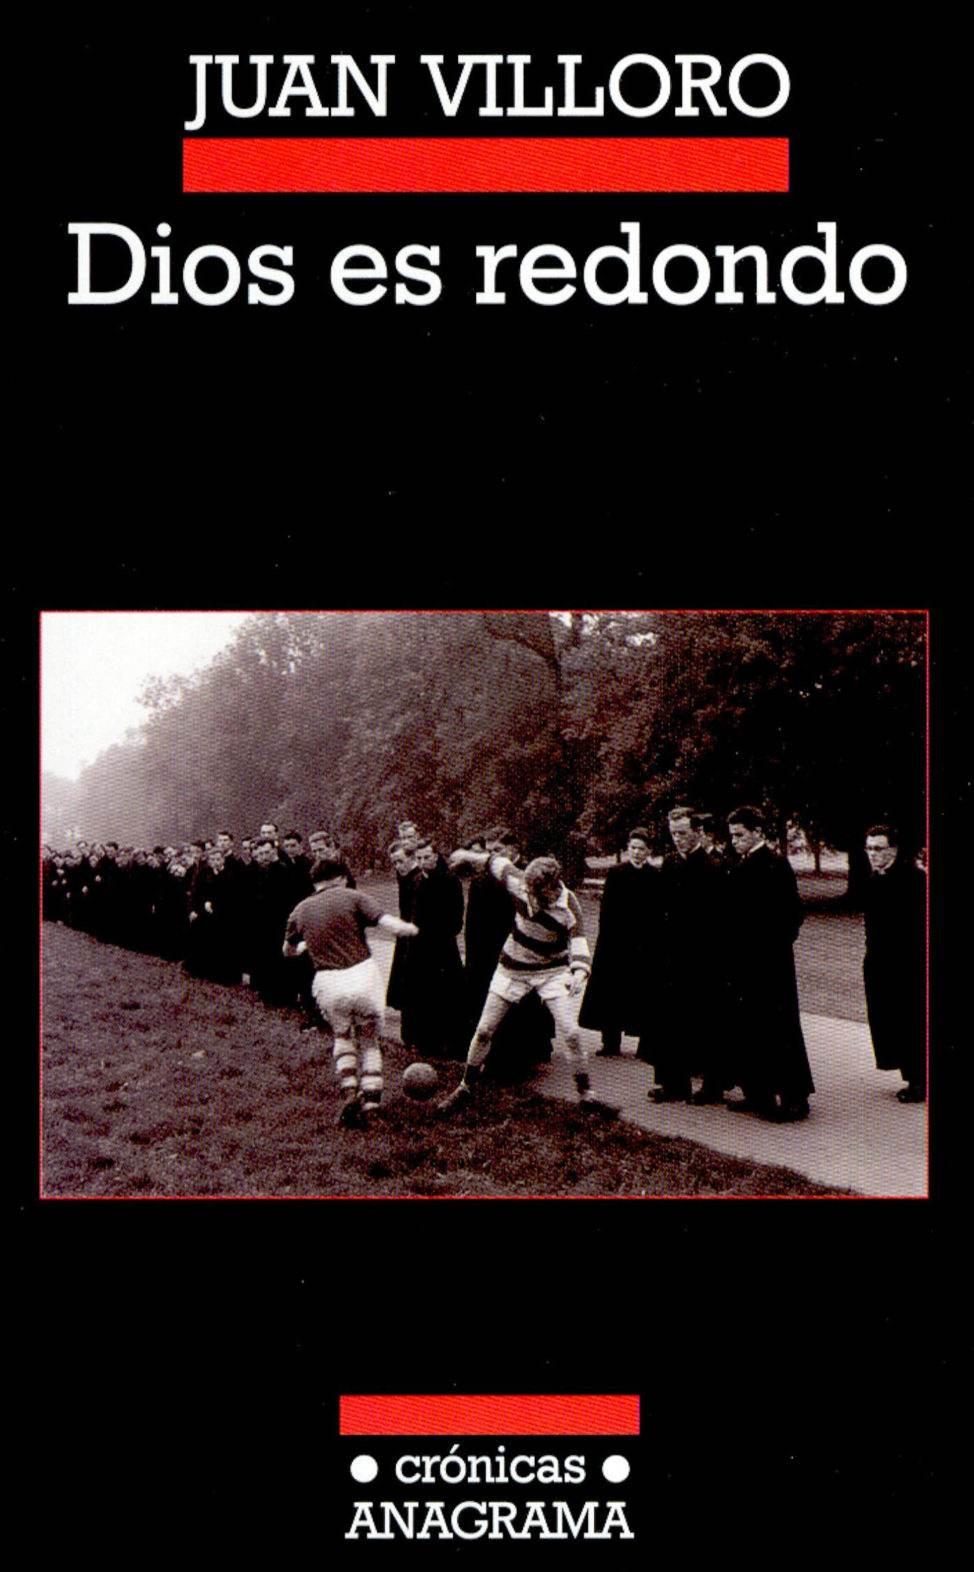 b898737a2d35e Libros sobre futbol que debes leer alguna vez en tu vida